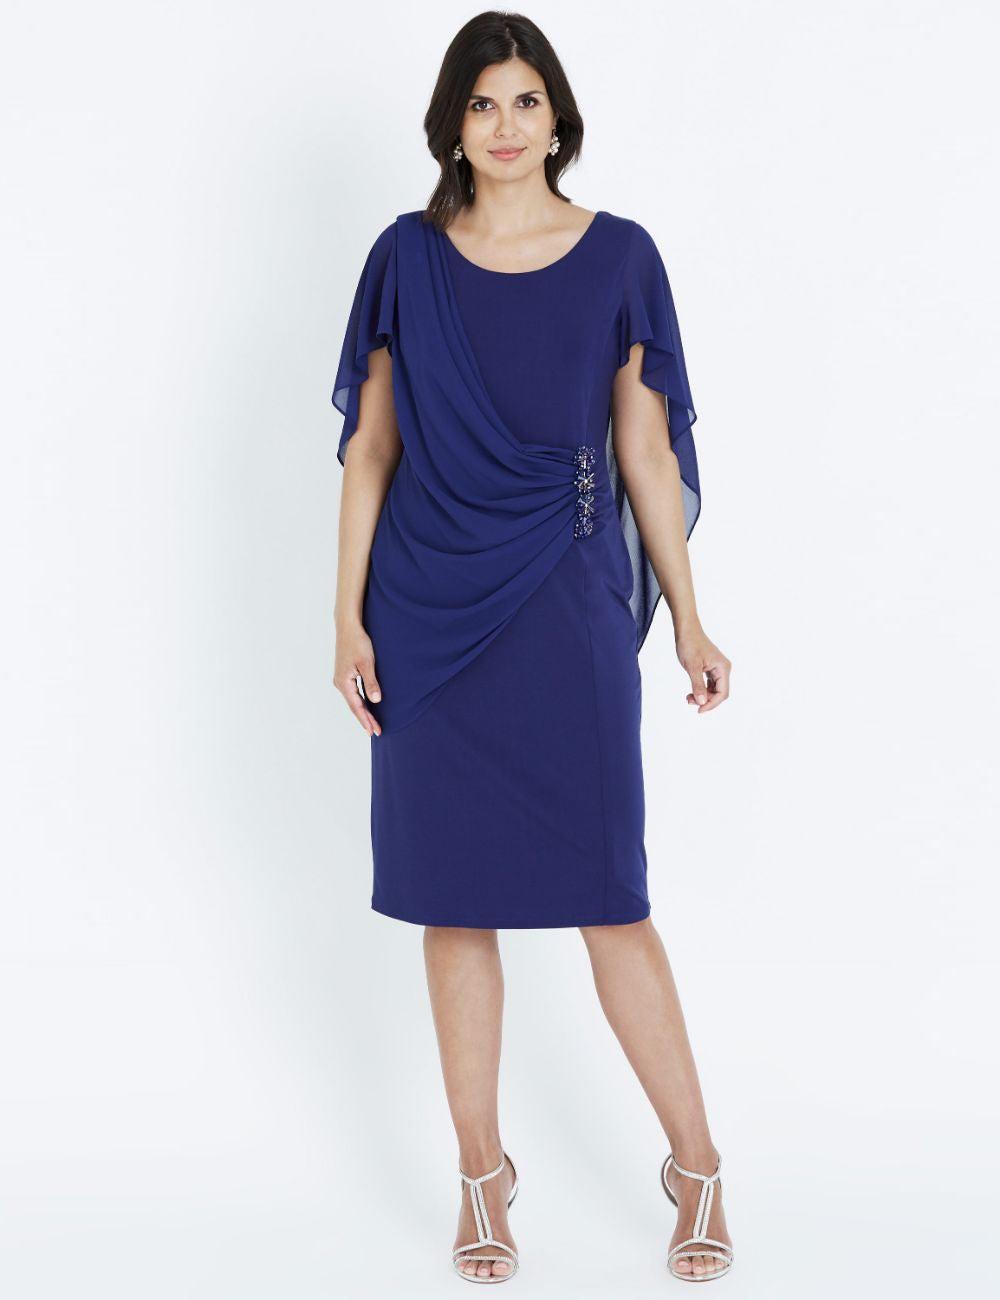 Shop Women's Evening Dresses   Noni B